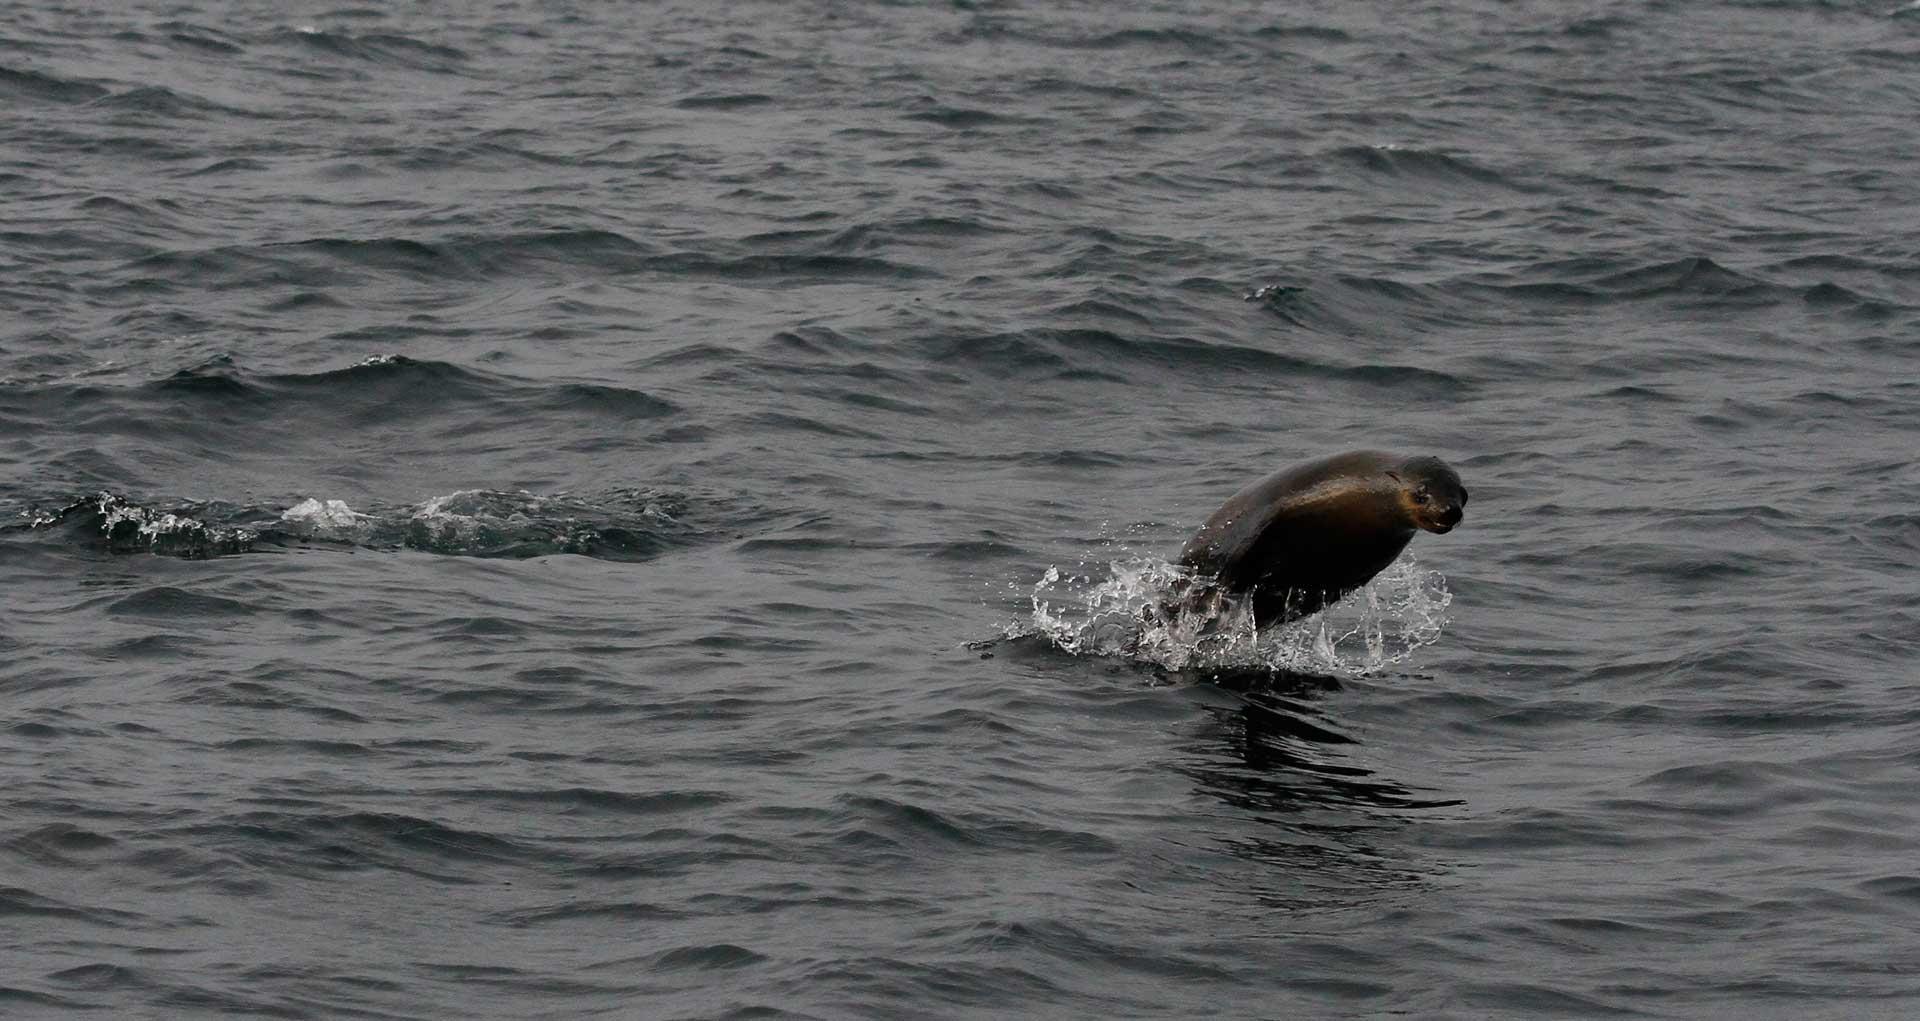 KOCKalison - a seal's survival guide